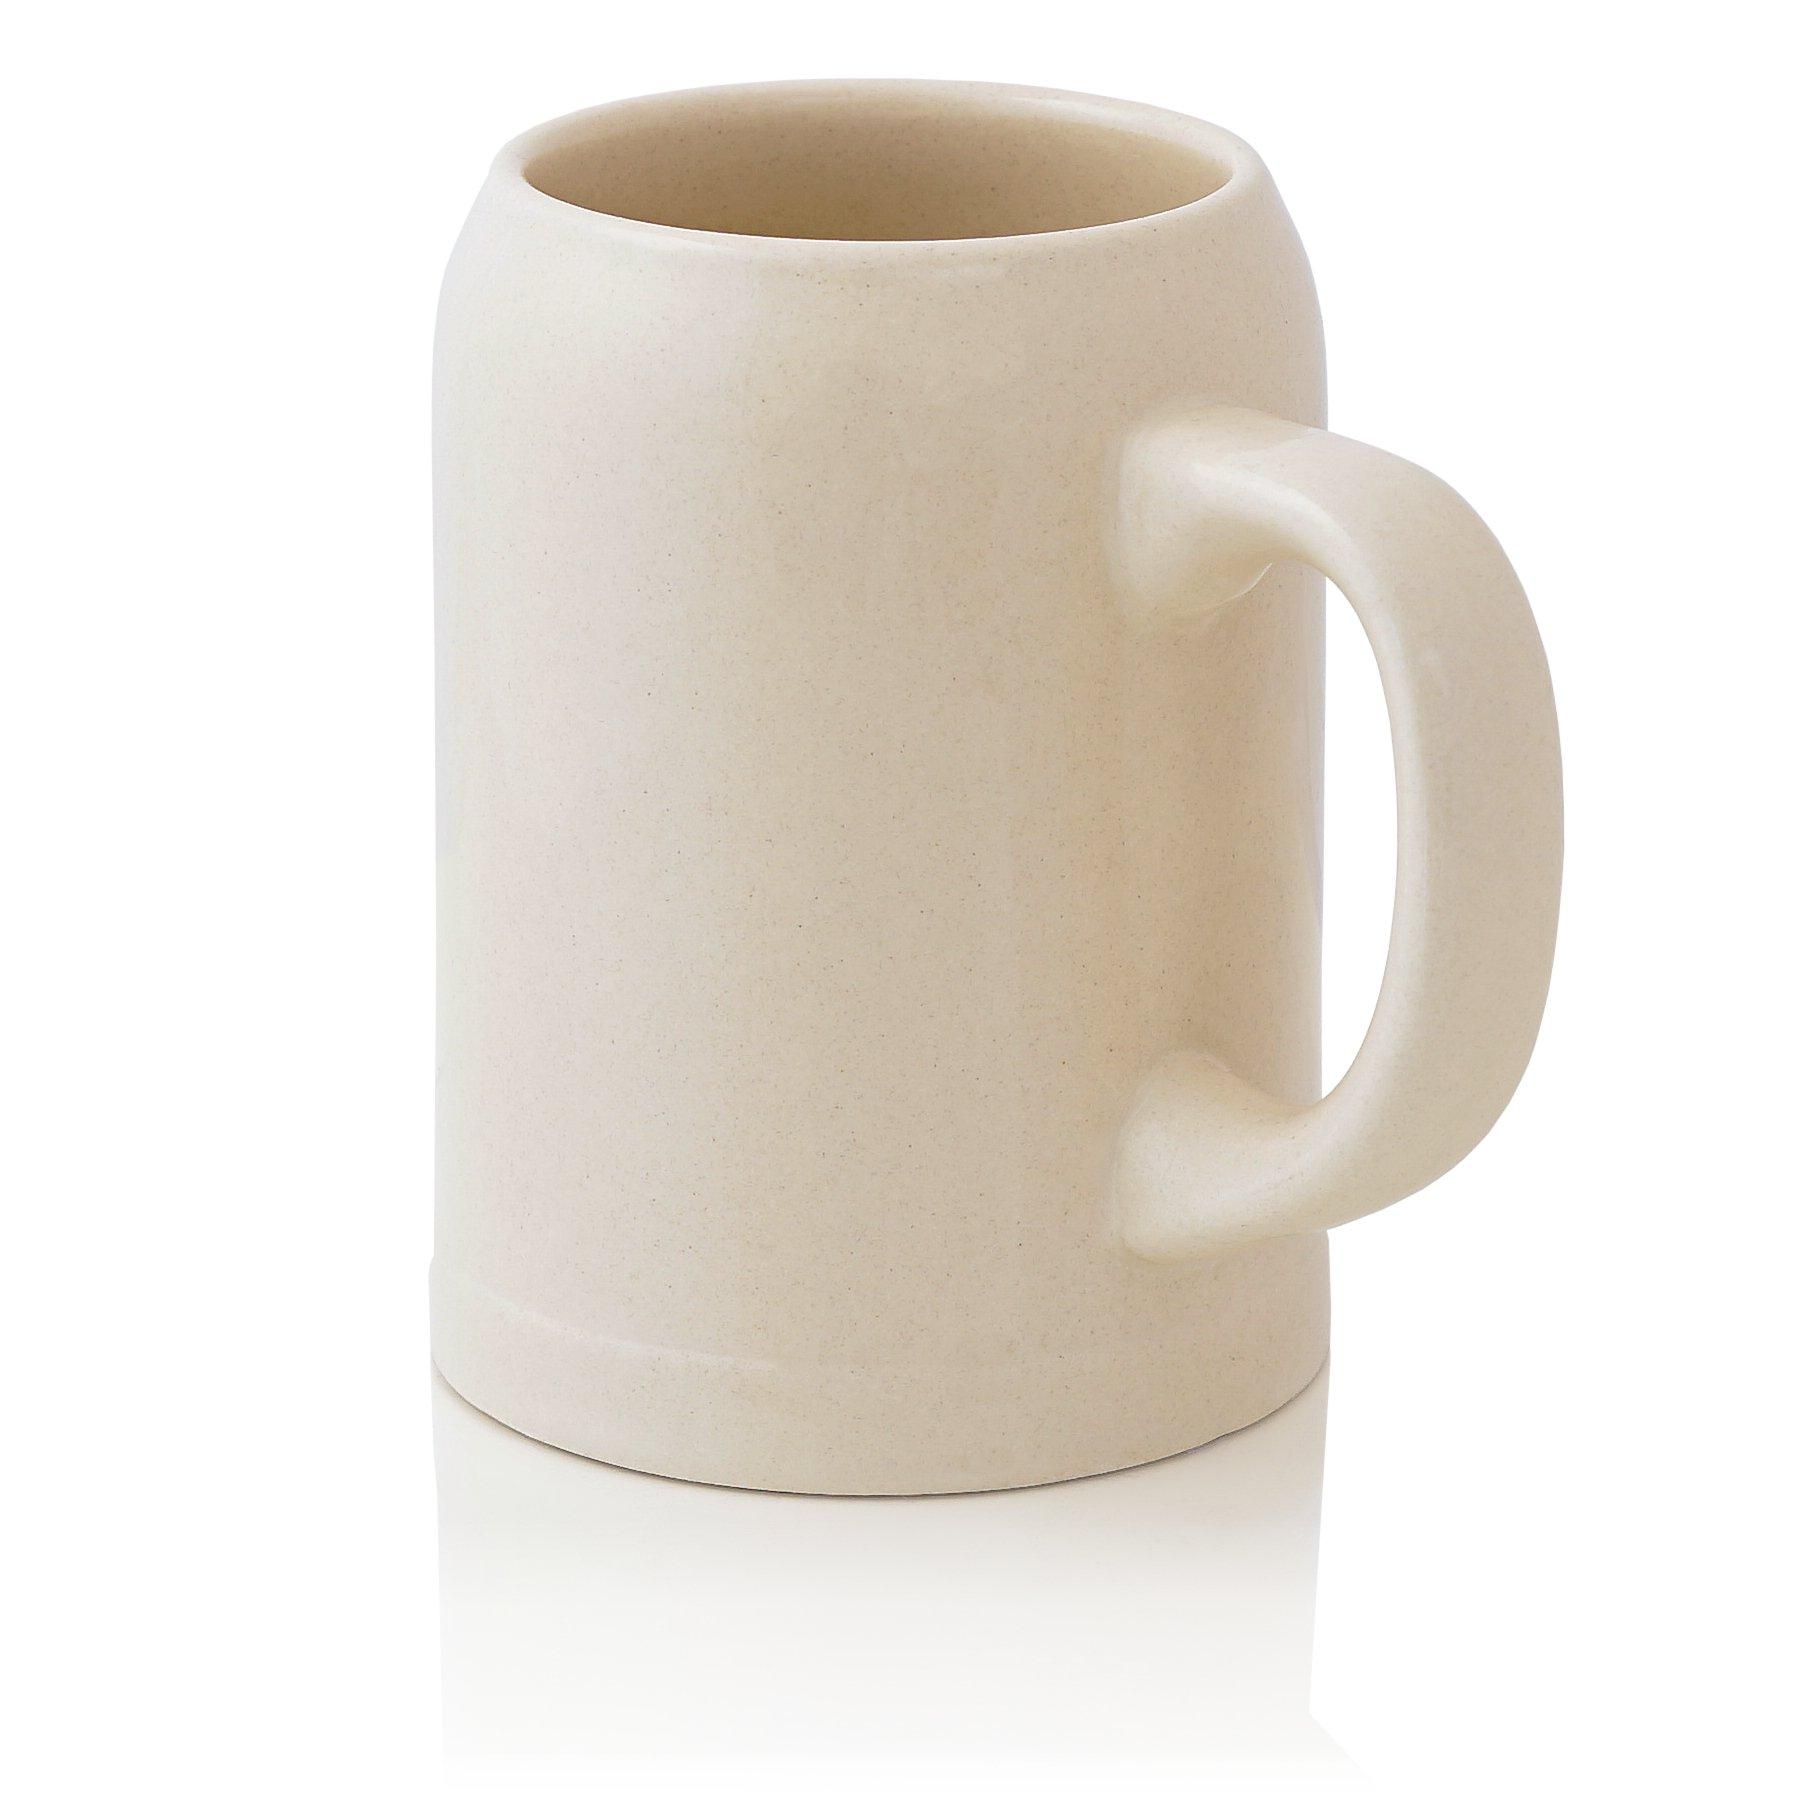 German Beer Stein 0.5 liter | Traditional Bavarian Beer Mug with handle | 0.5 liter (1 pt.) | beige | Made in Germany